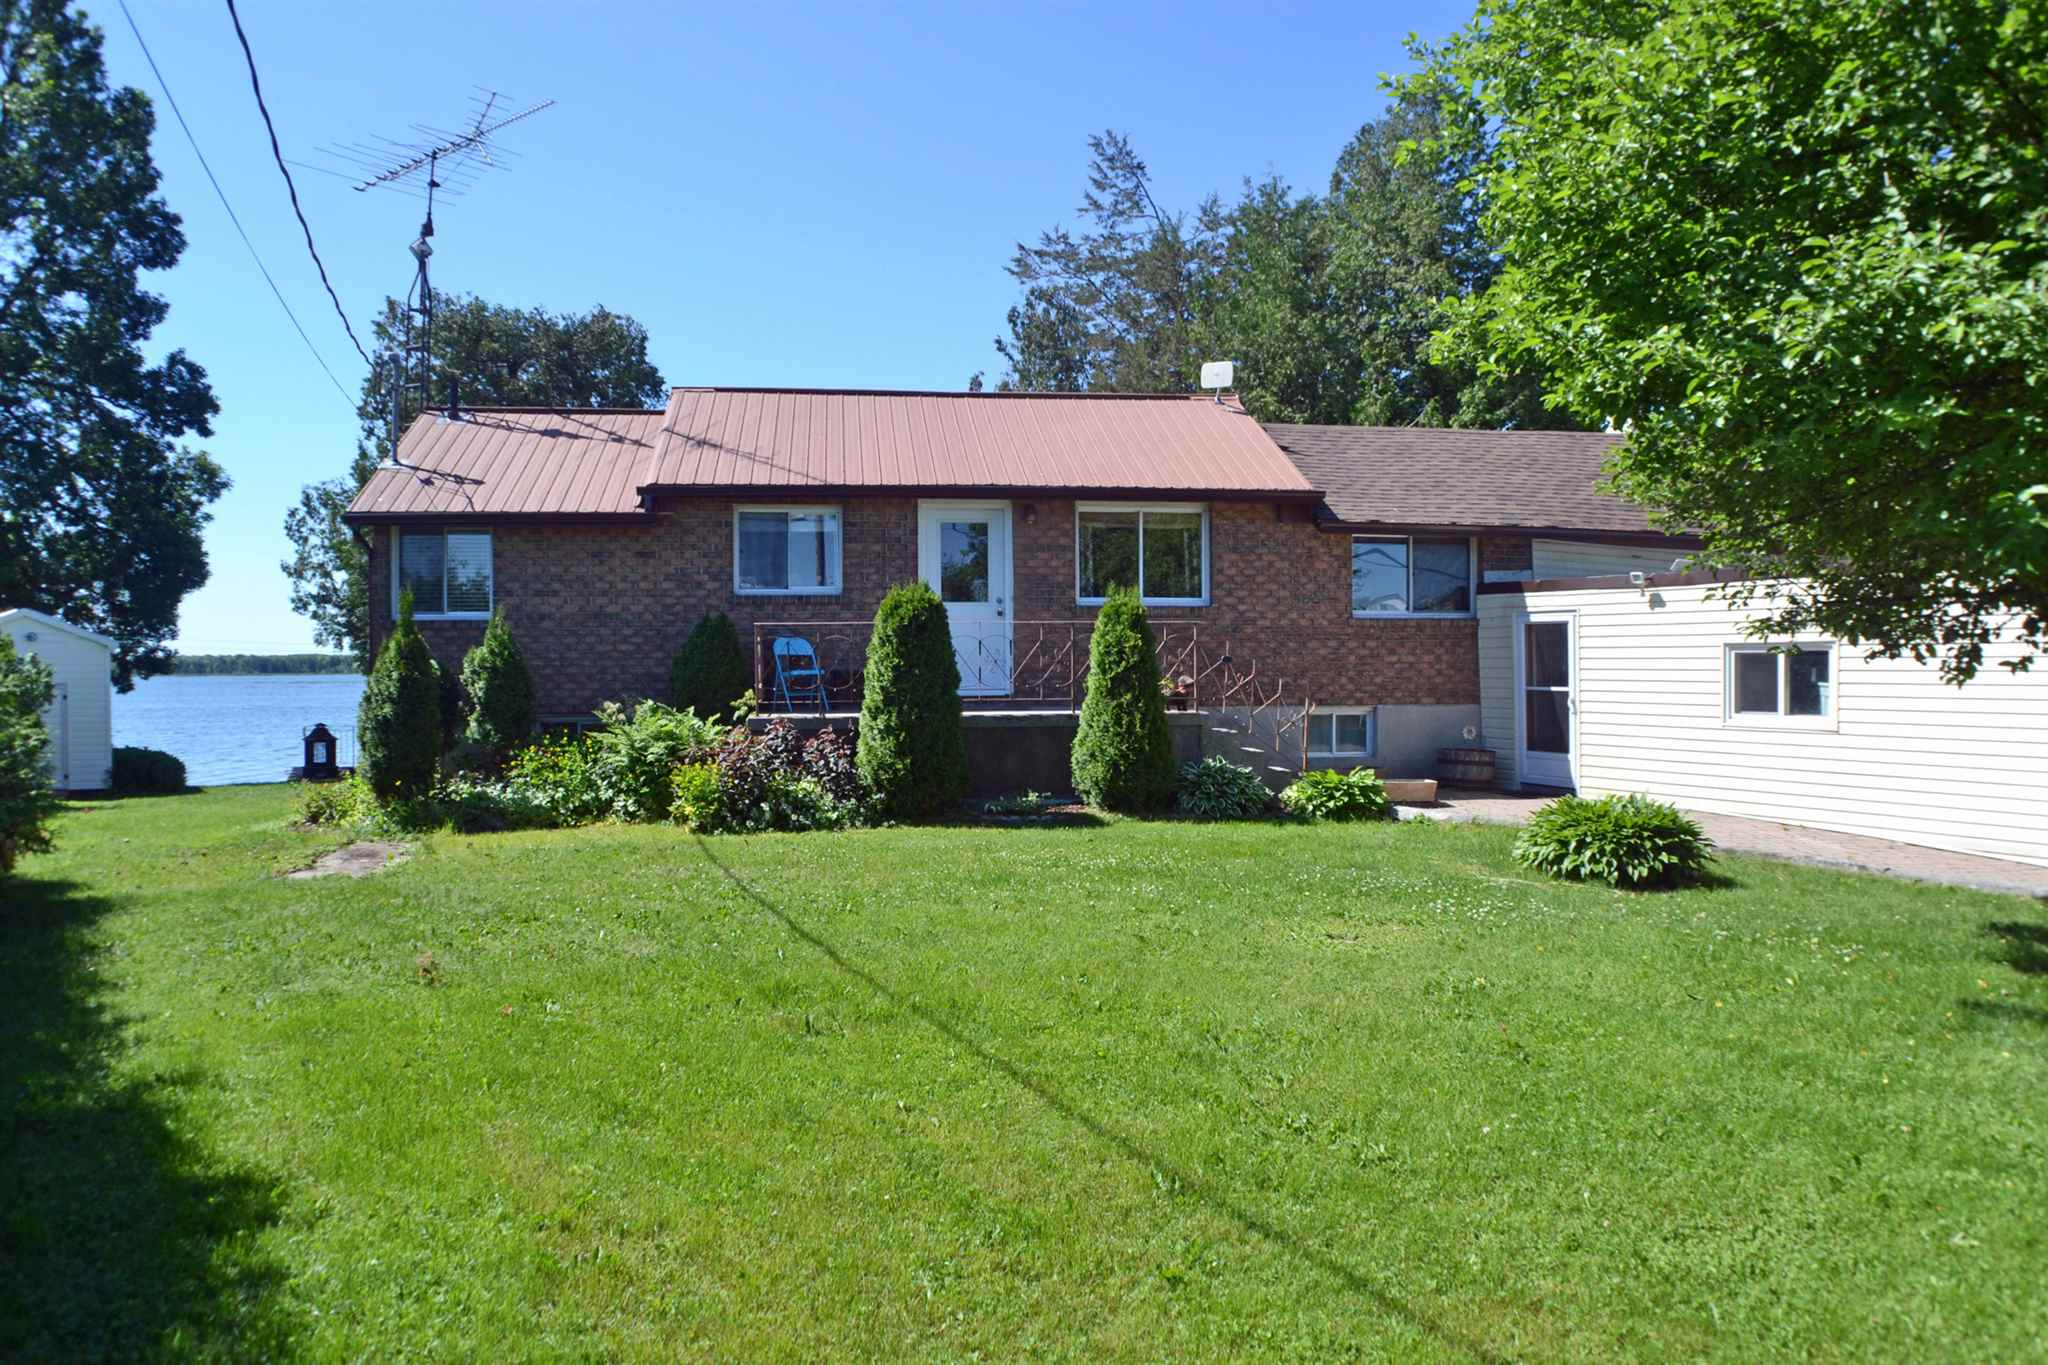 327 Red Cedar Point Road, Stone Mills, Ontario, Canada